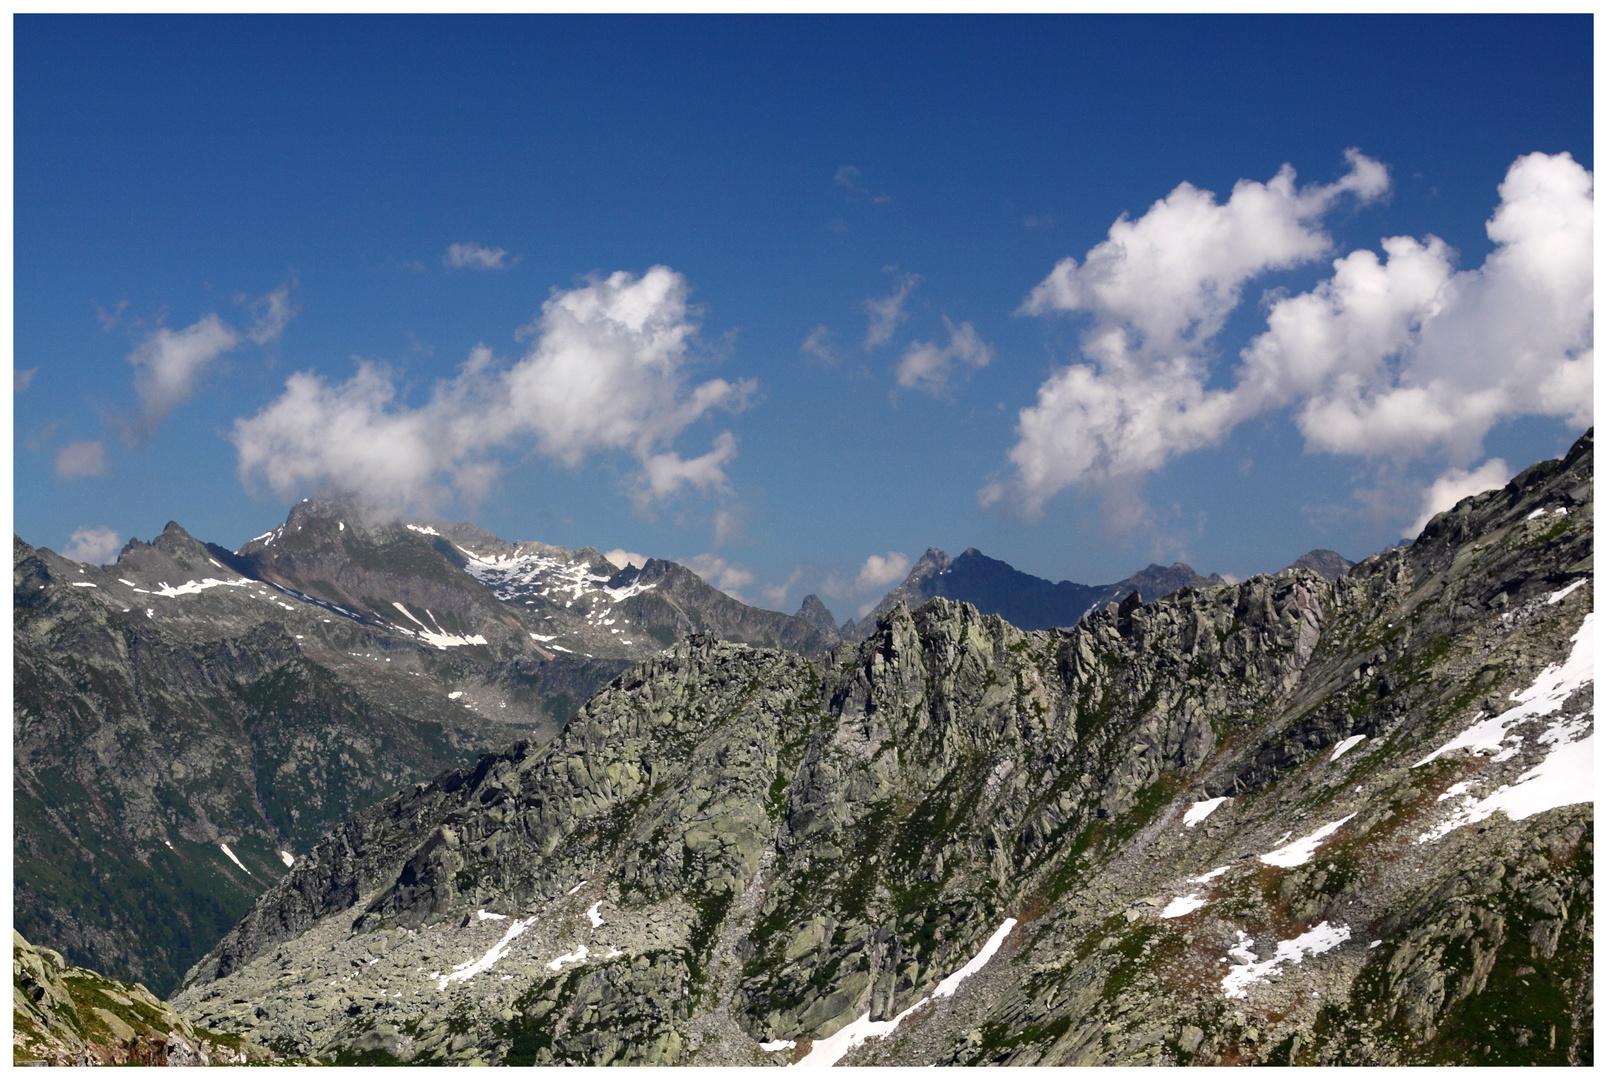 Tessin / Ticino 2010 Lage del Naret _ Blick über die Kante des Tals